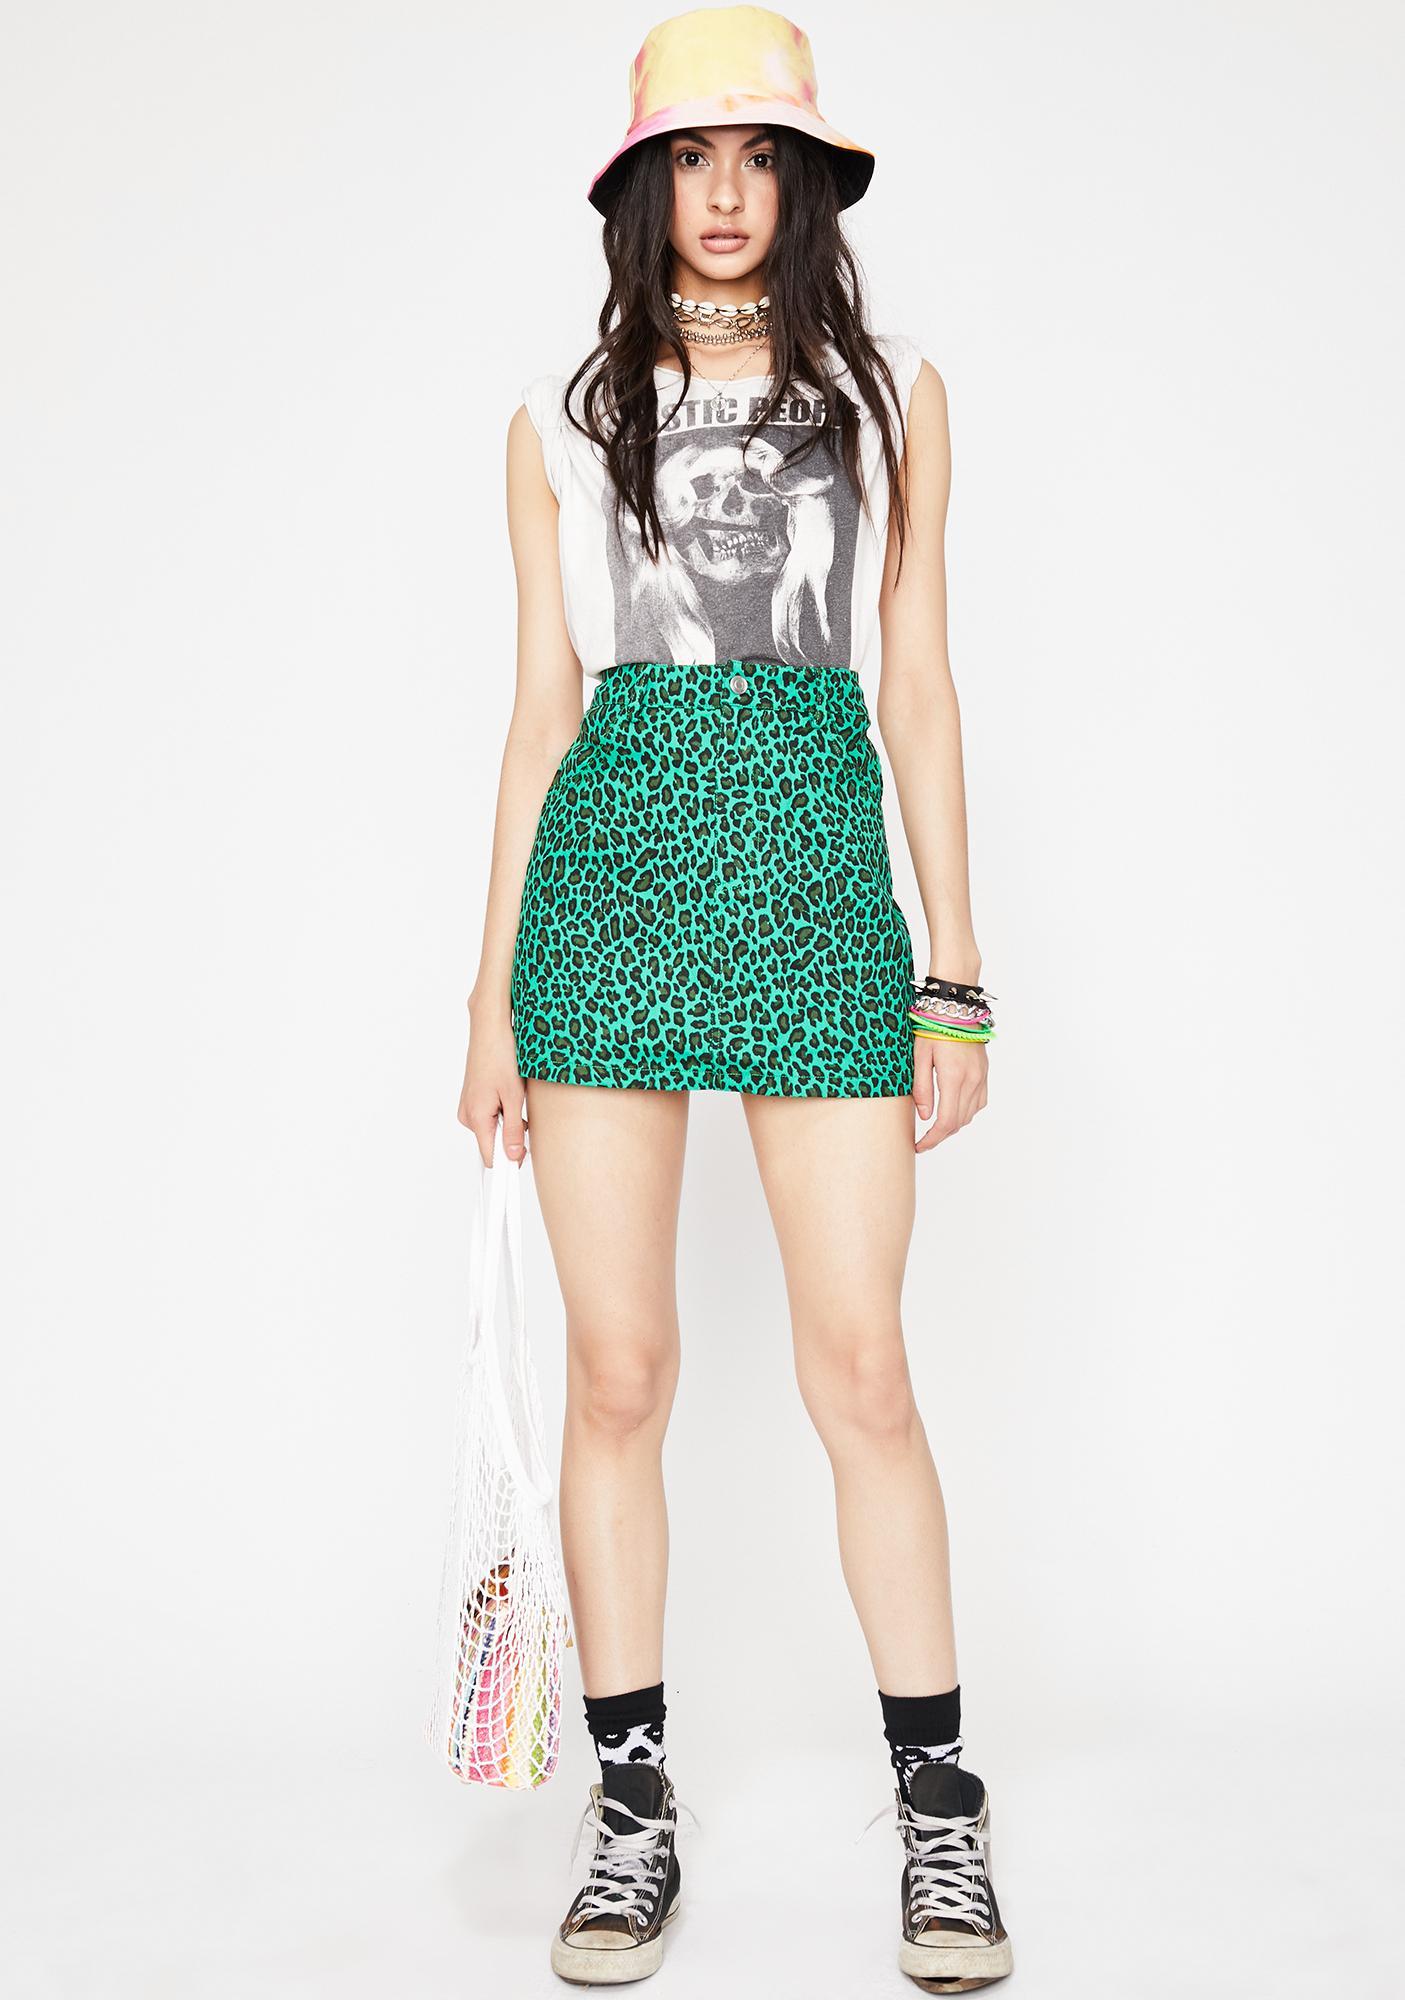 Kush Stunt Kitten Leopard Skirt